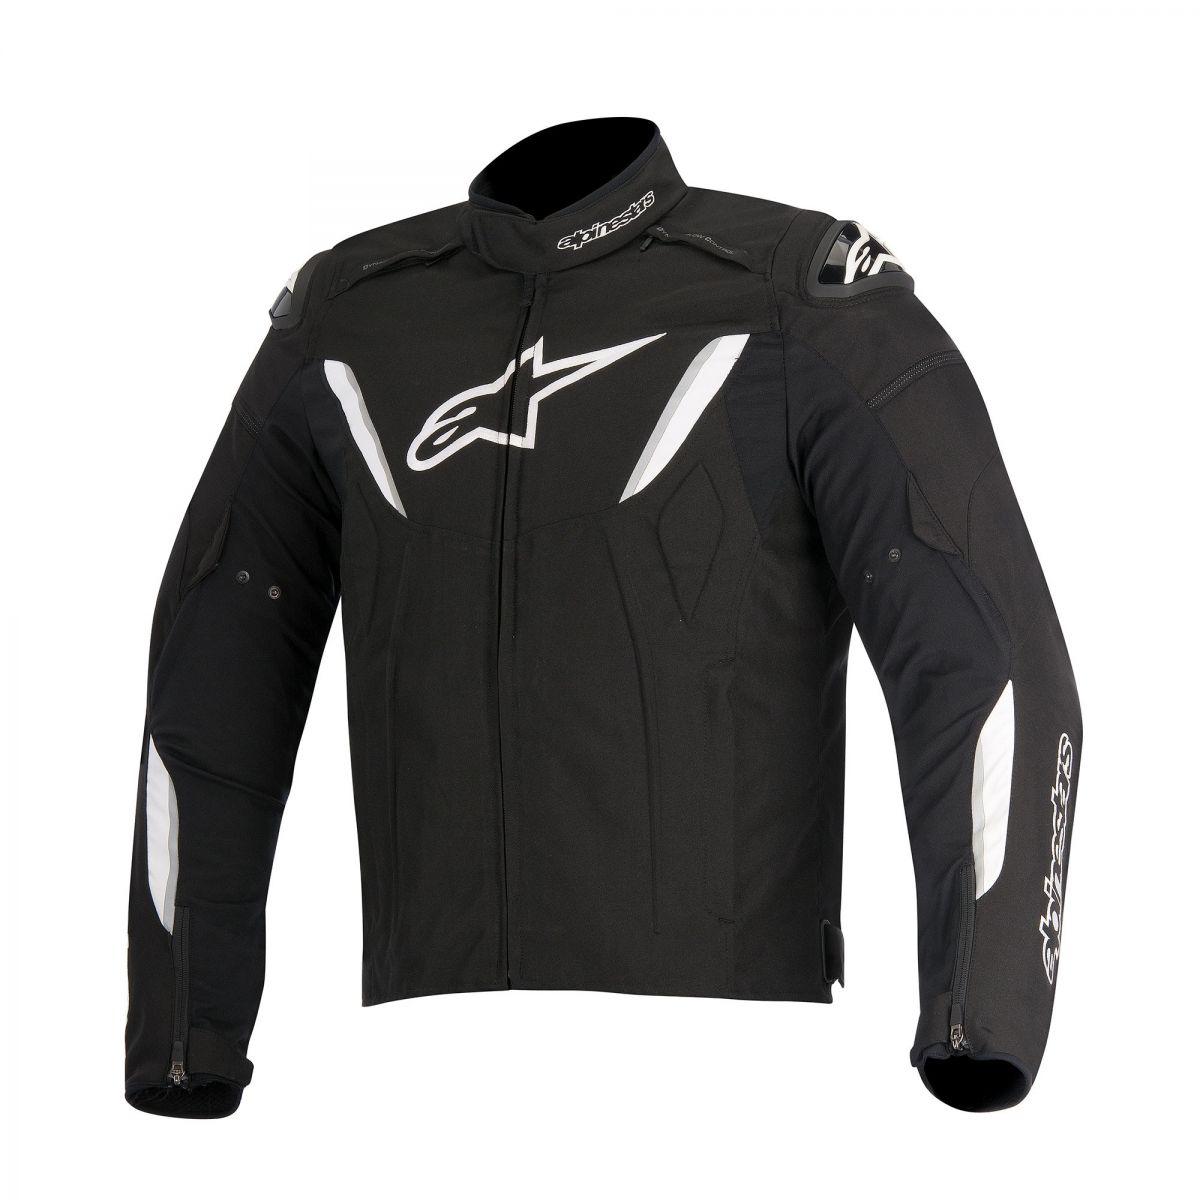 Jaqueta Alpinestars T-GP R (Black/ White) IMPERMEÁVEL LANÇAMENTO!